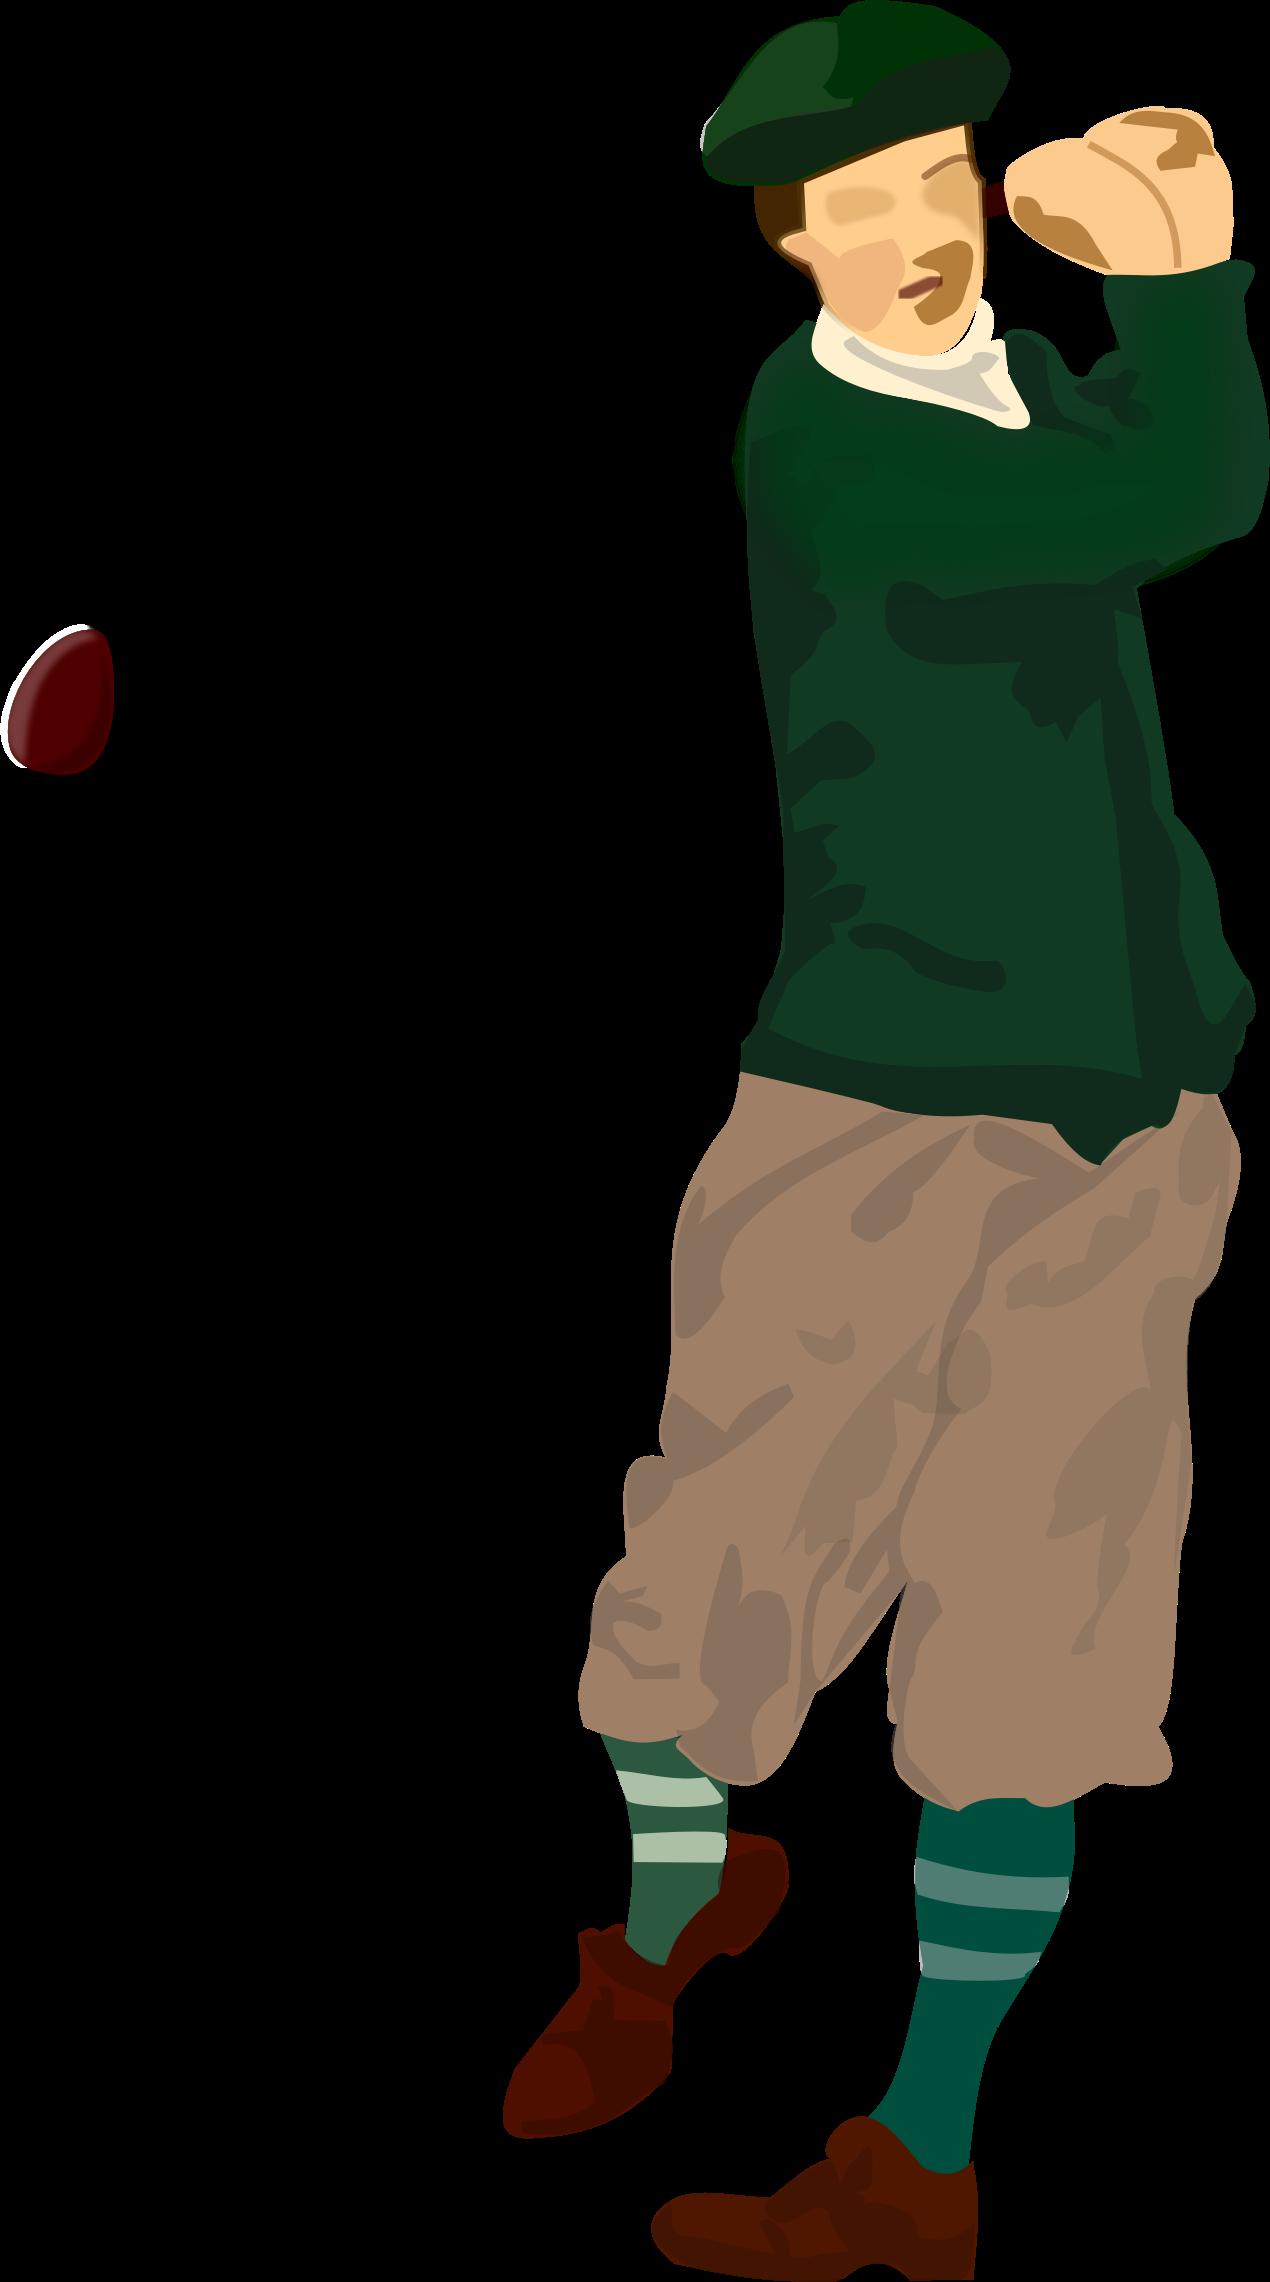 banner royalty free download Golfer big image png. Golf clipart golf player